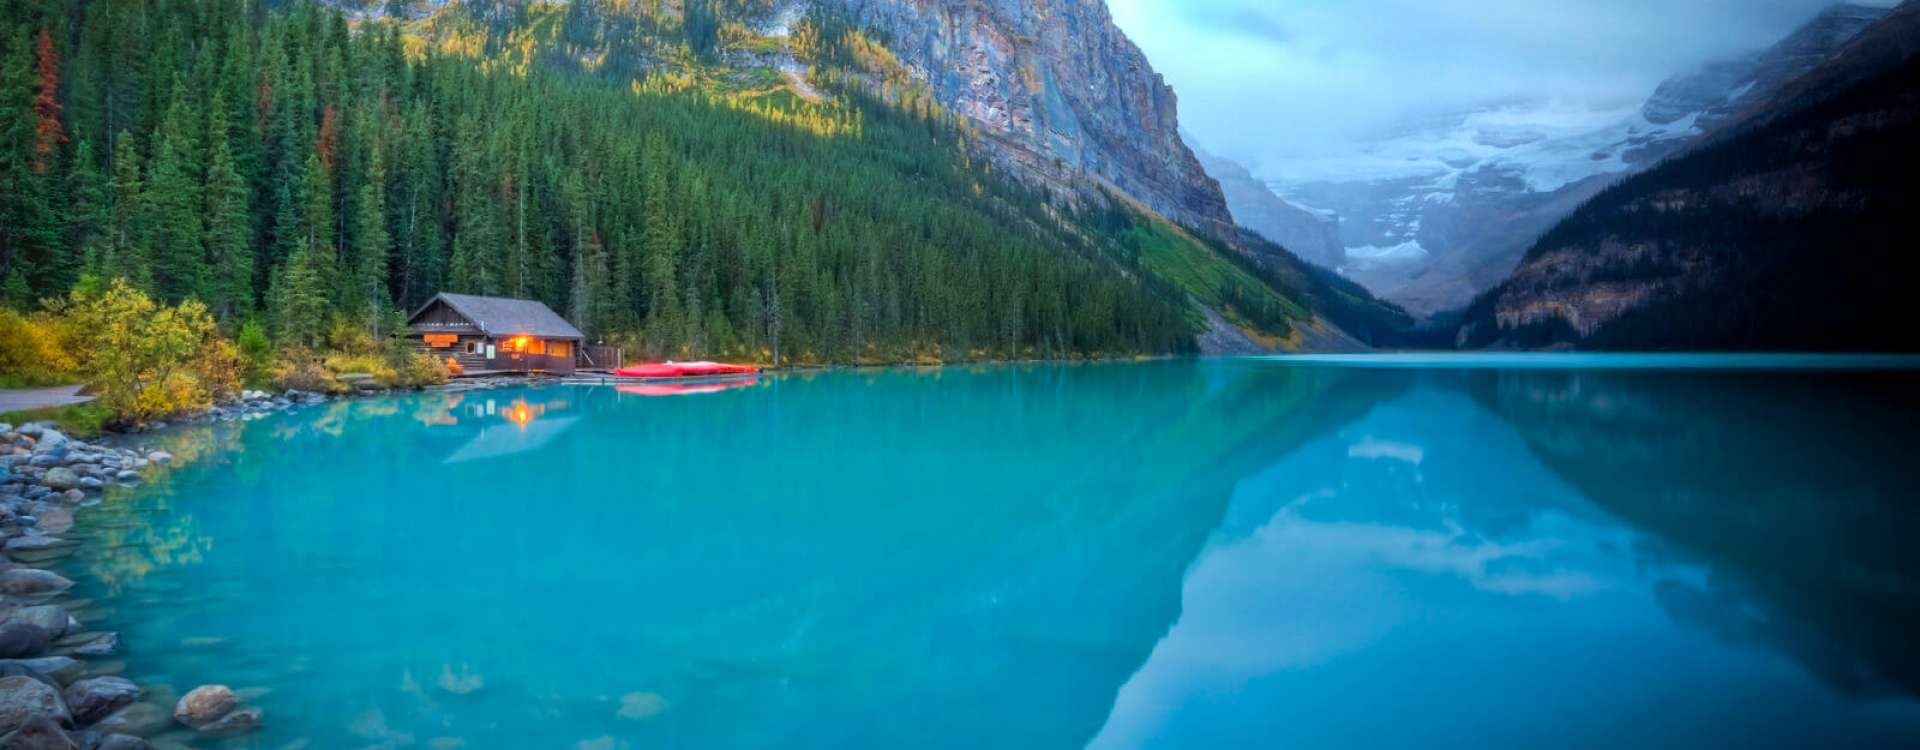 Cabins Suites Lake Louise Alberta Canada Paradise Lodge